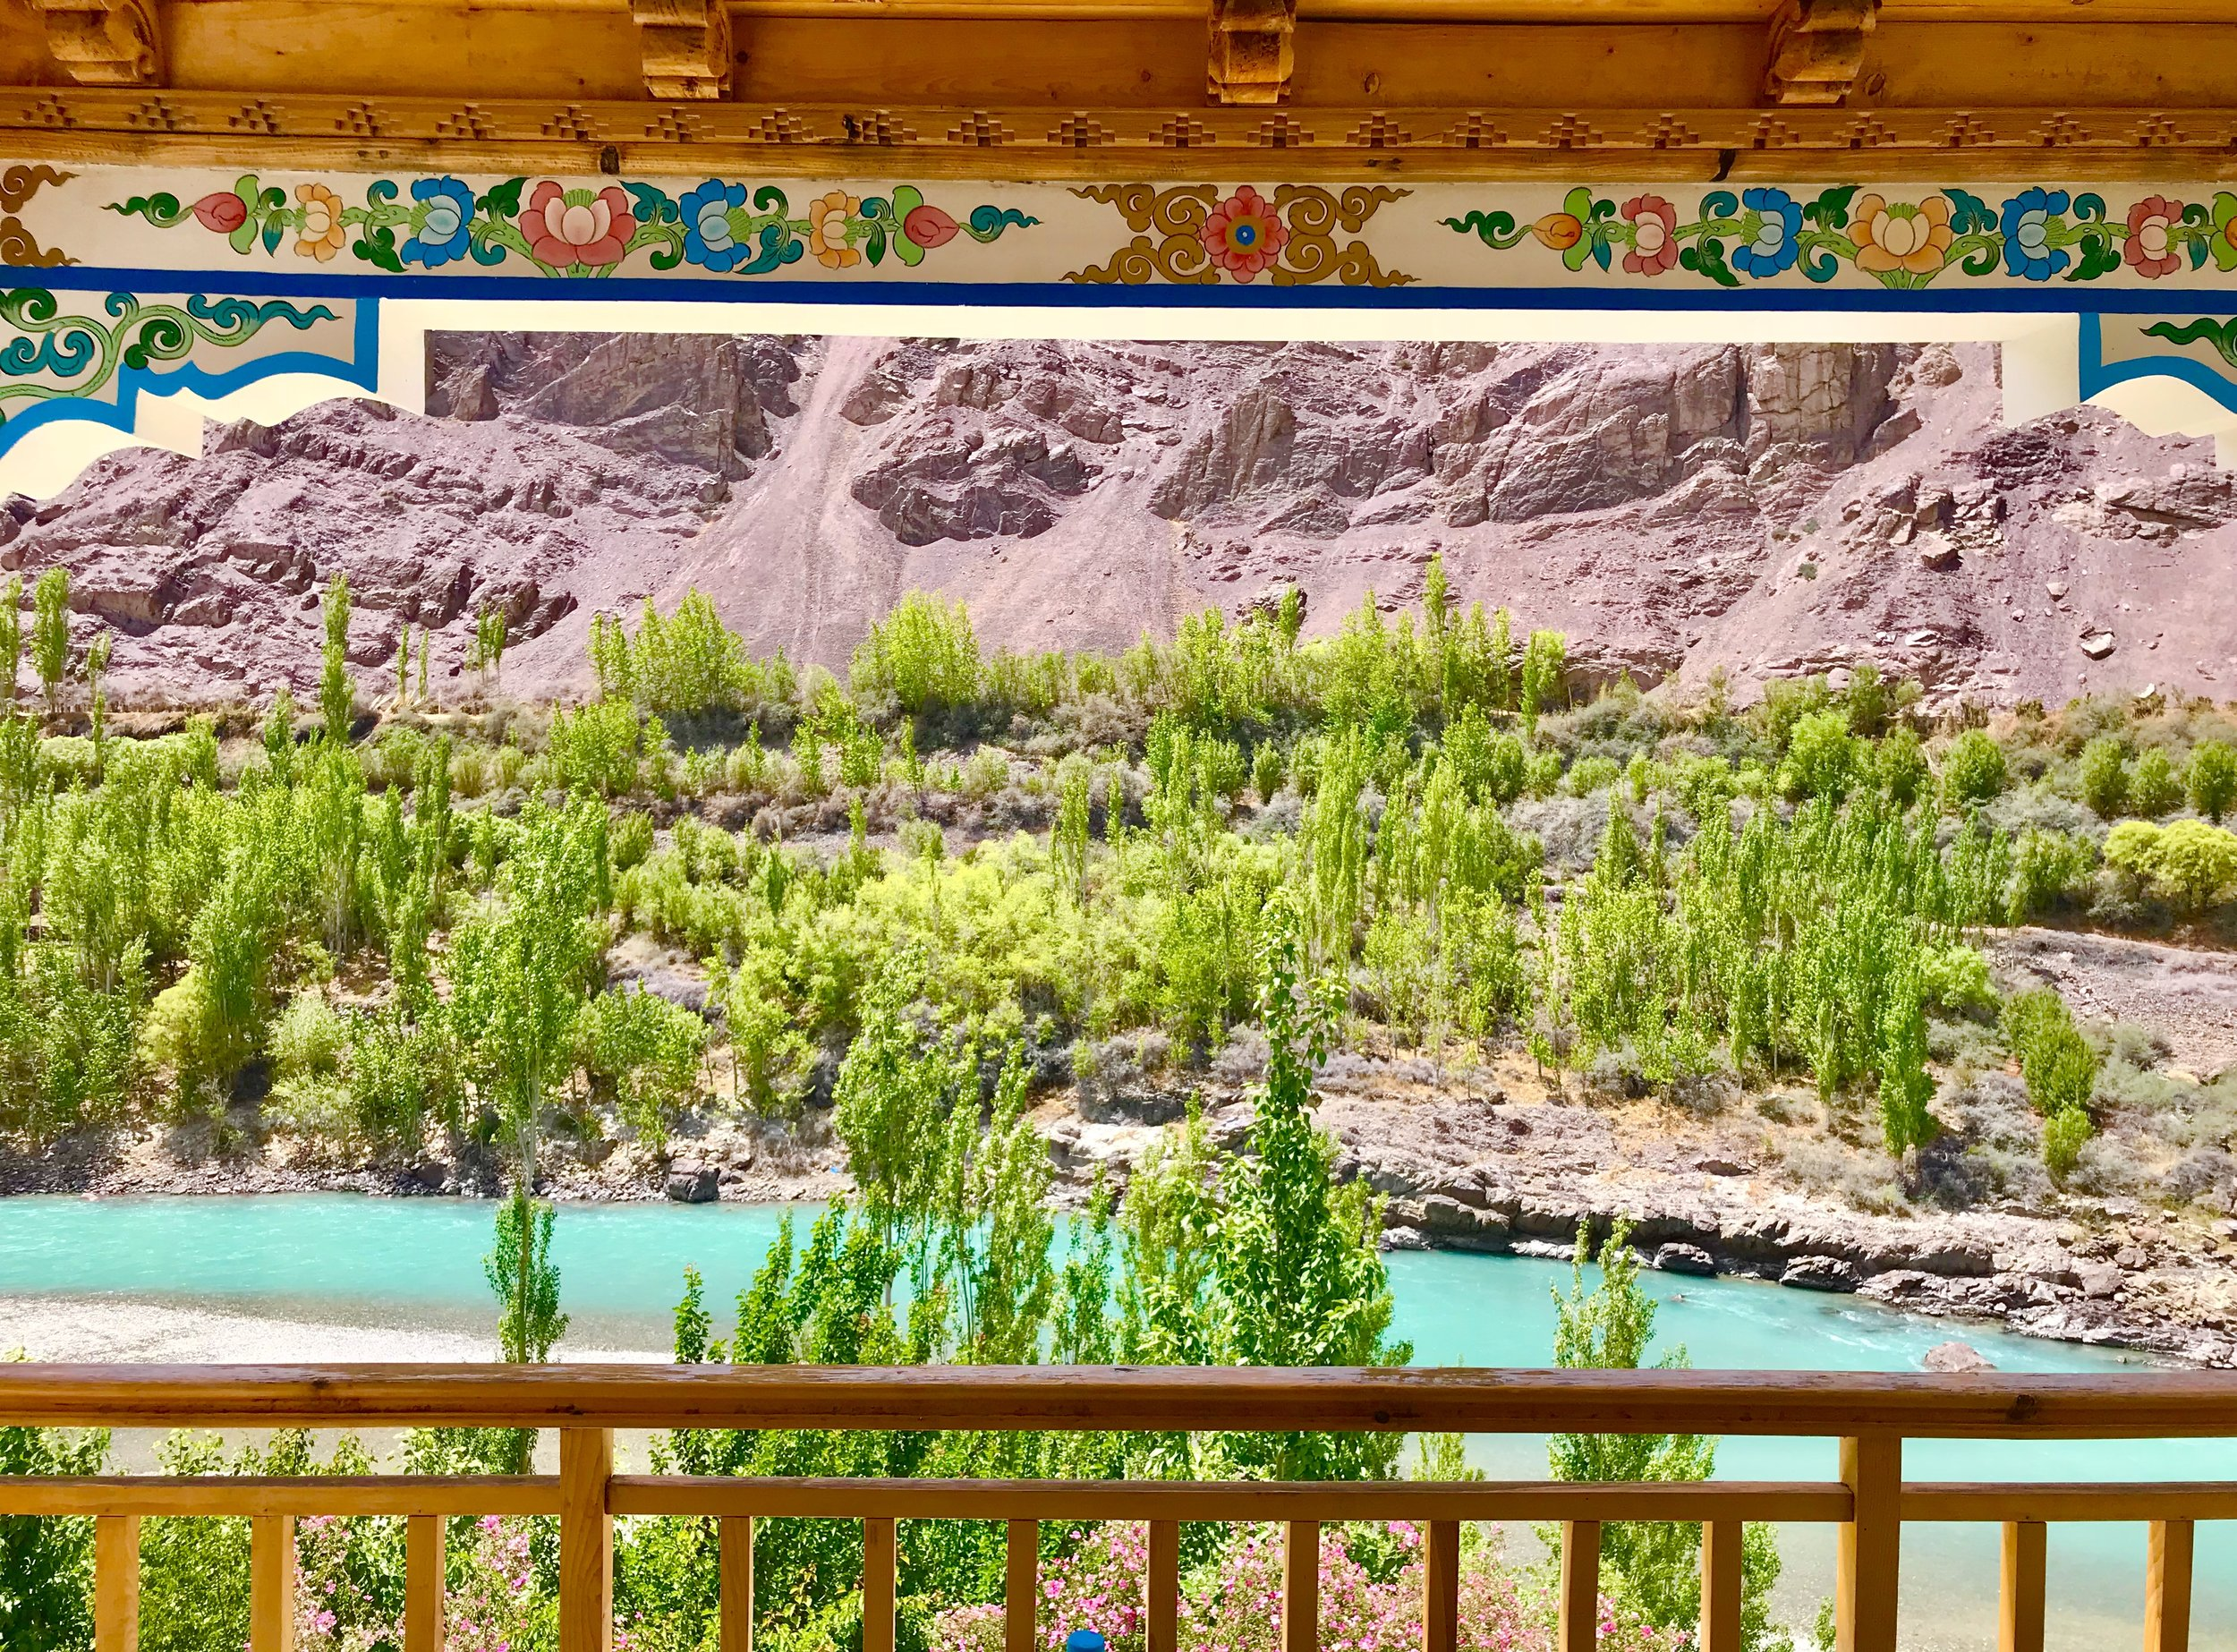 Raakhee's view from her balcony at Nurla, Ladakh